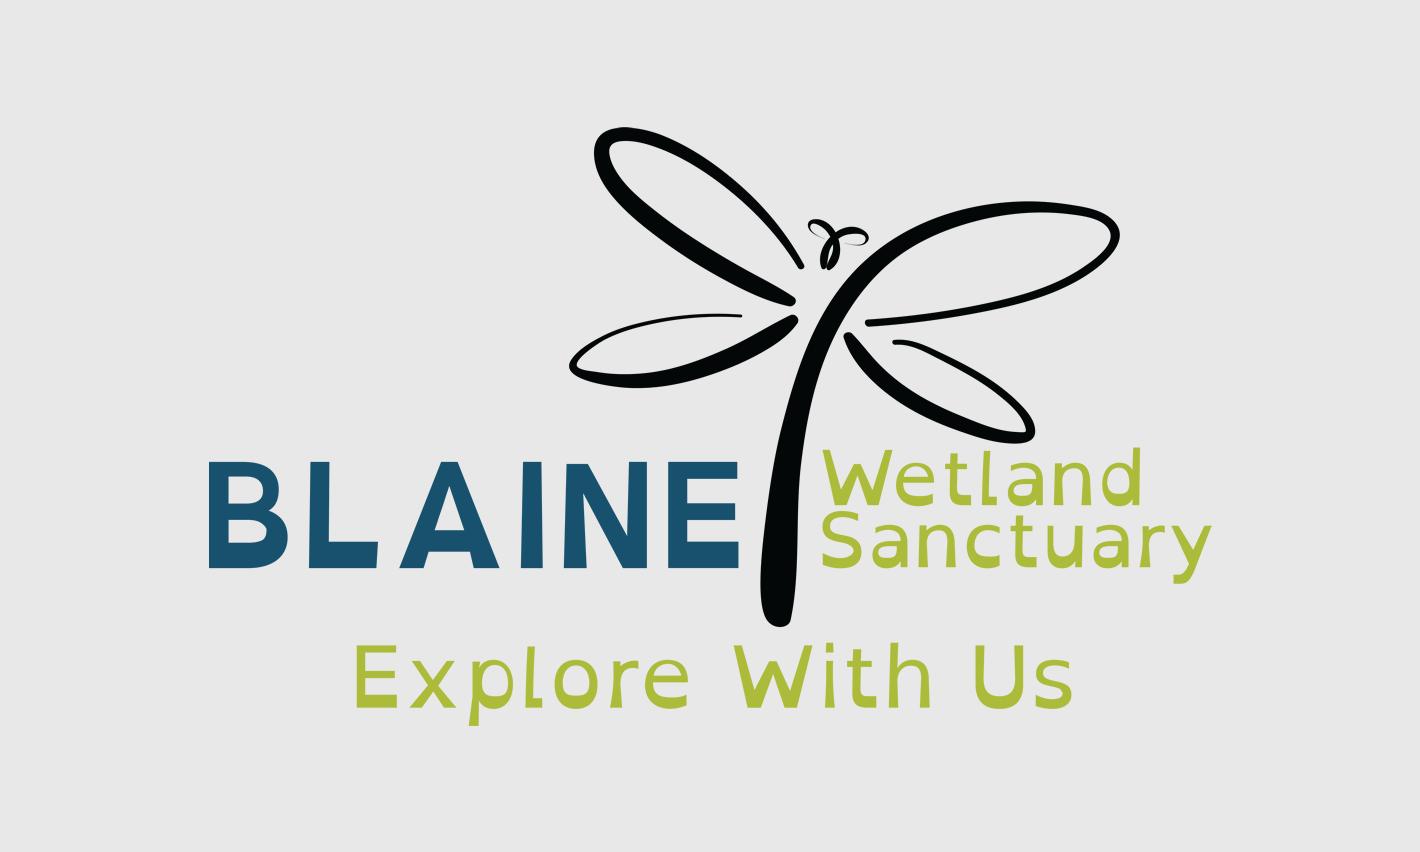 Blaine Wetland Sanctuary Logo Design